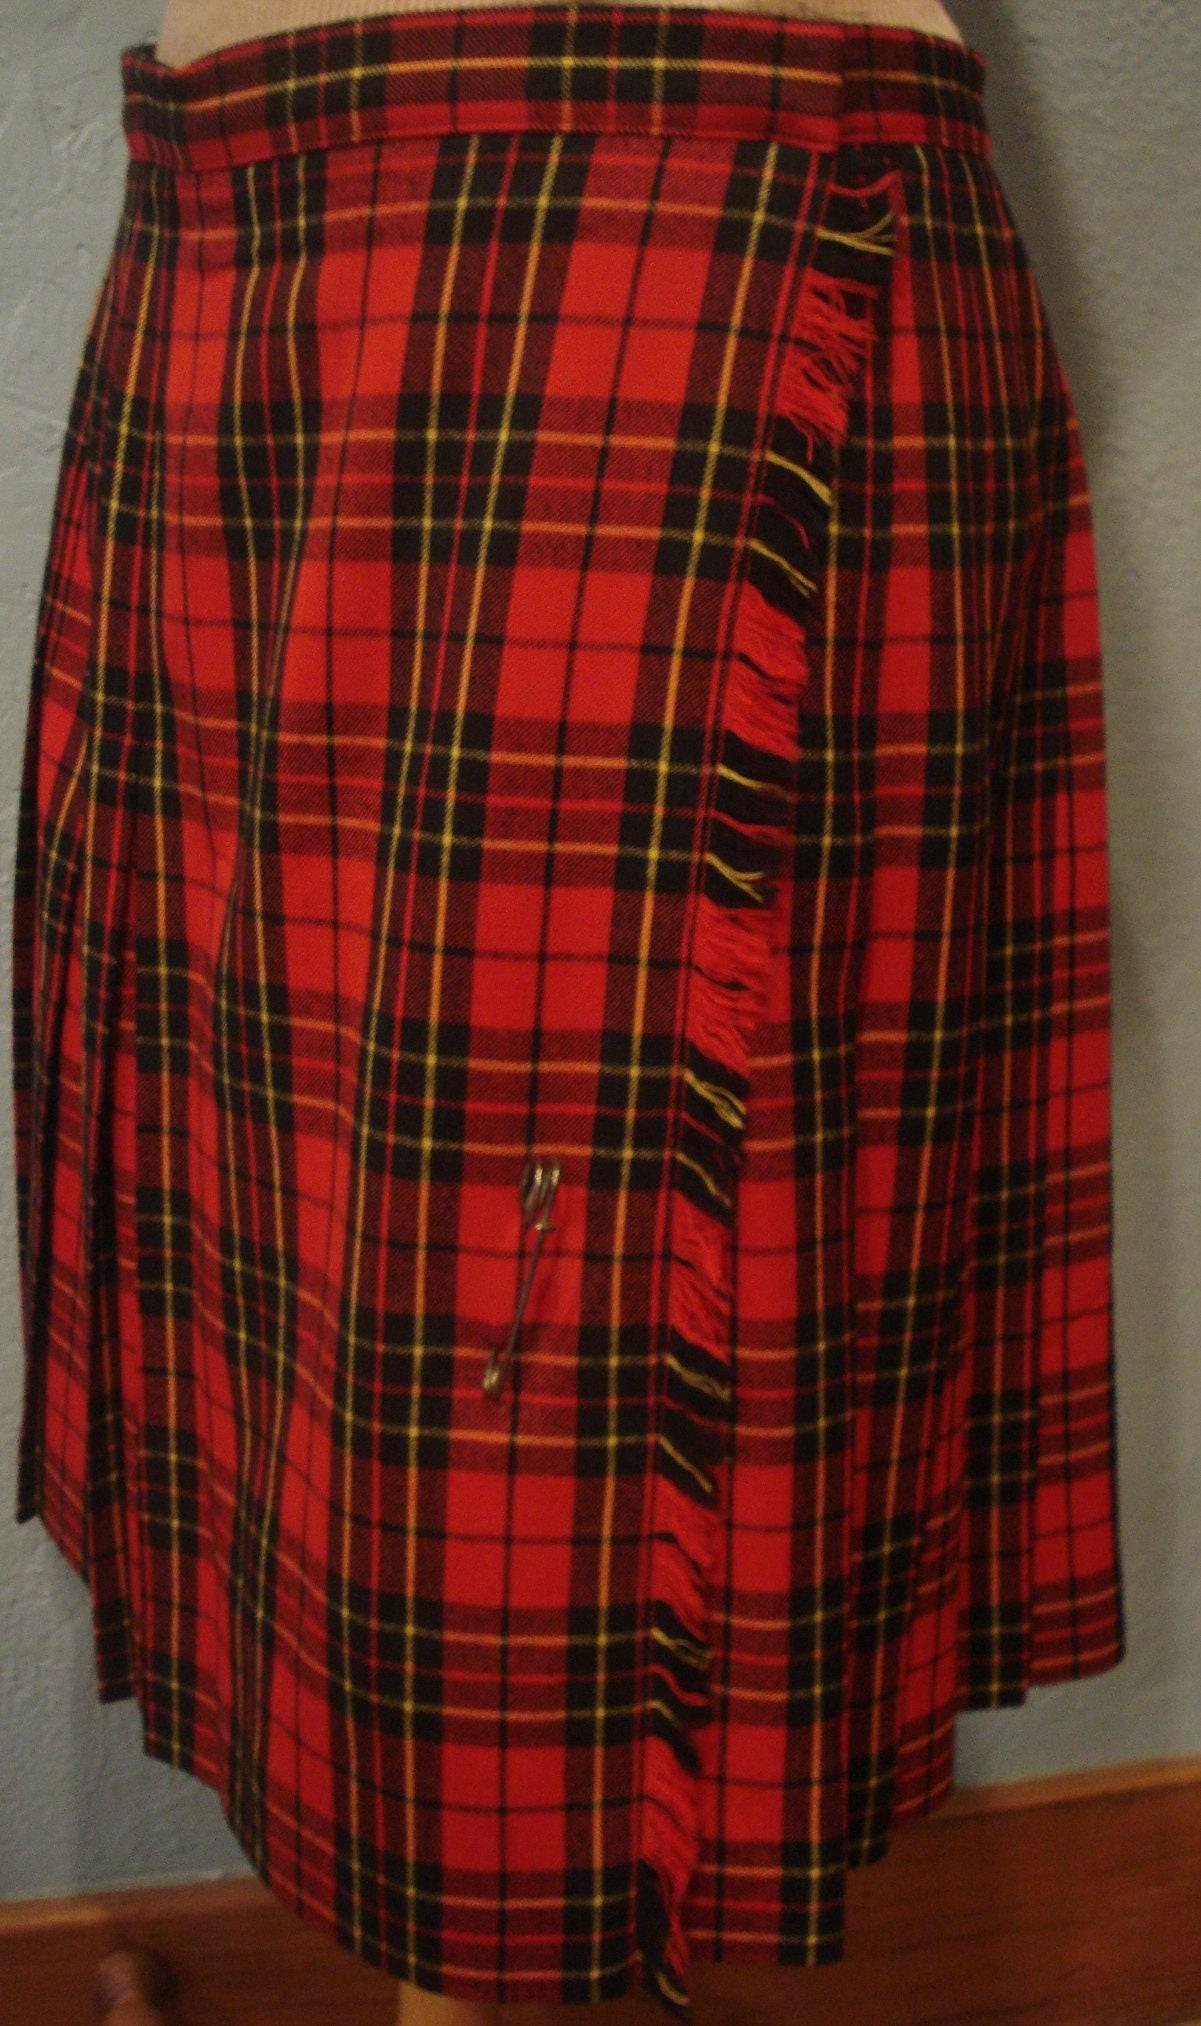 81decc7208 90's Traditional Tartan Plaid Pleated Wrap Skirt Size 14 100% Wool ...